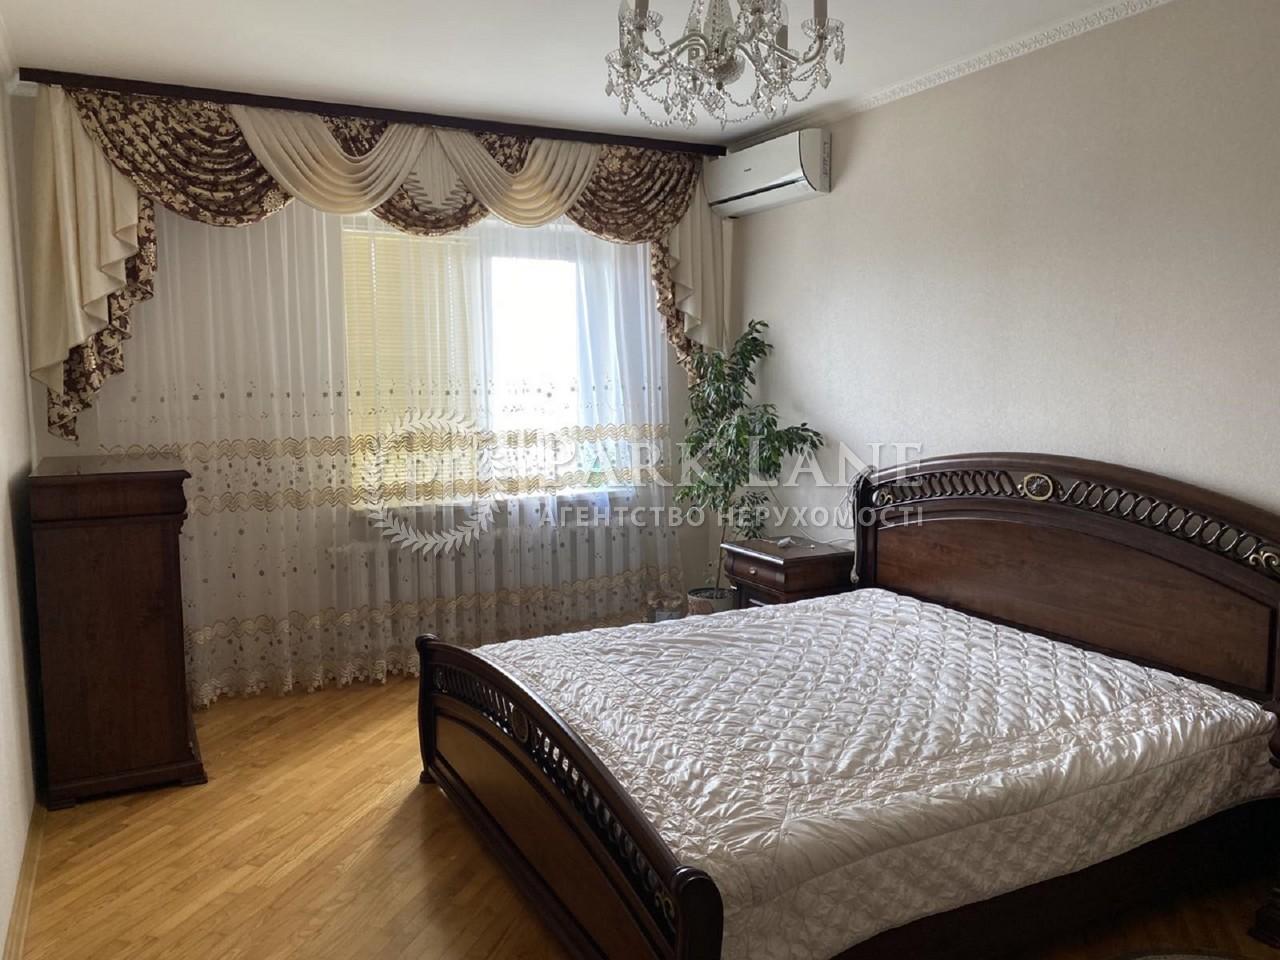 Квартира ул. Драгоманова, 31б, Киев, R-39564 - Фото 5